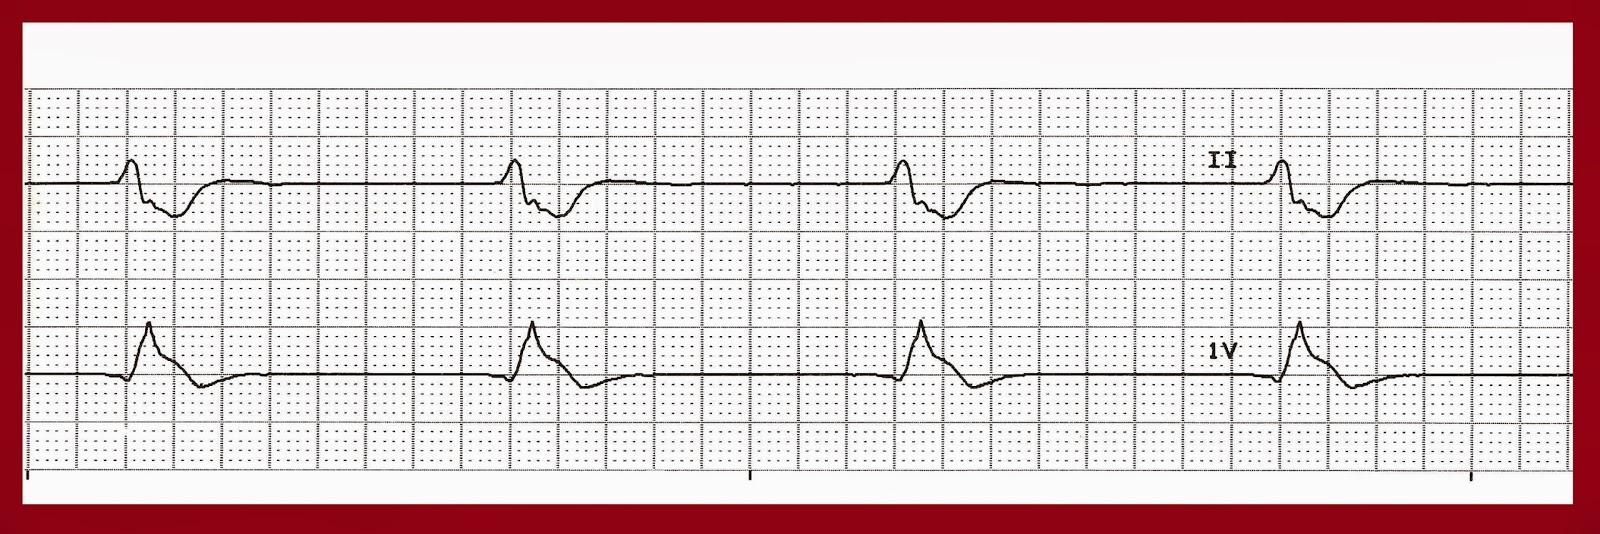 Heart rhythm strip practice